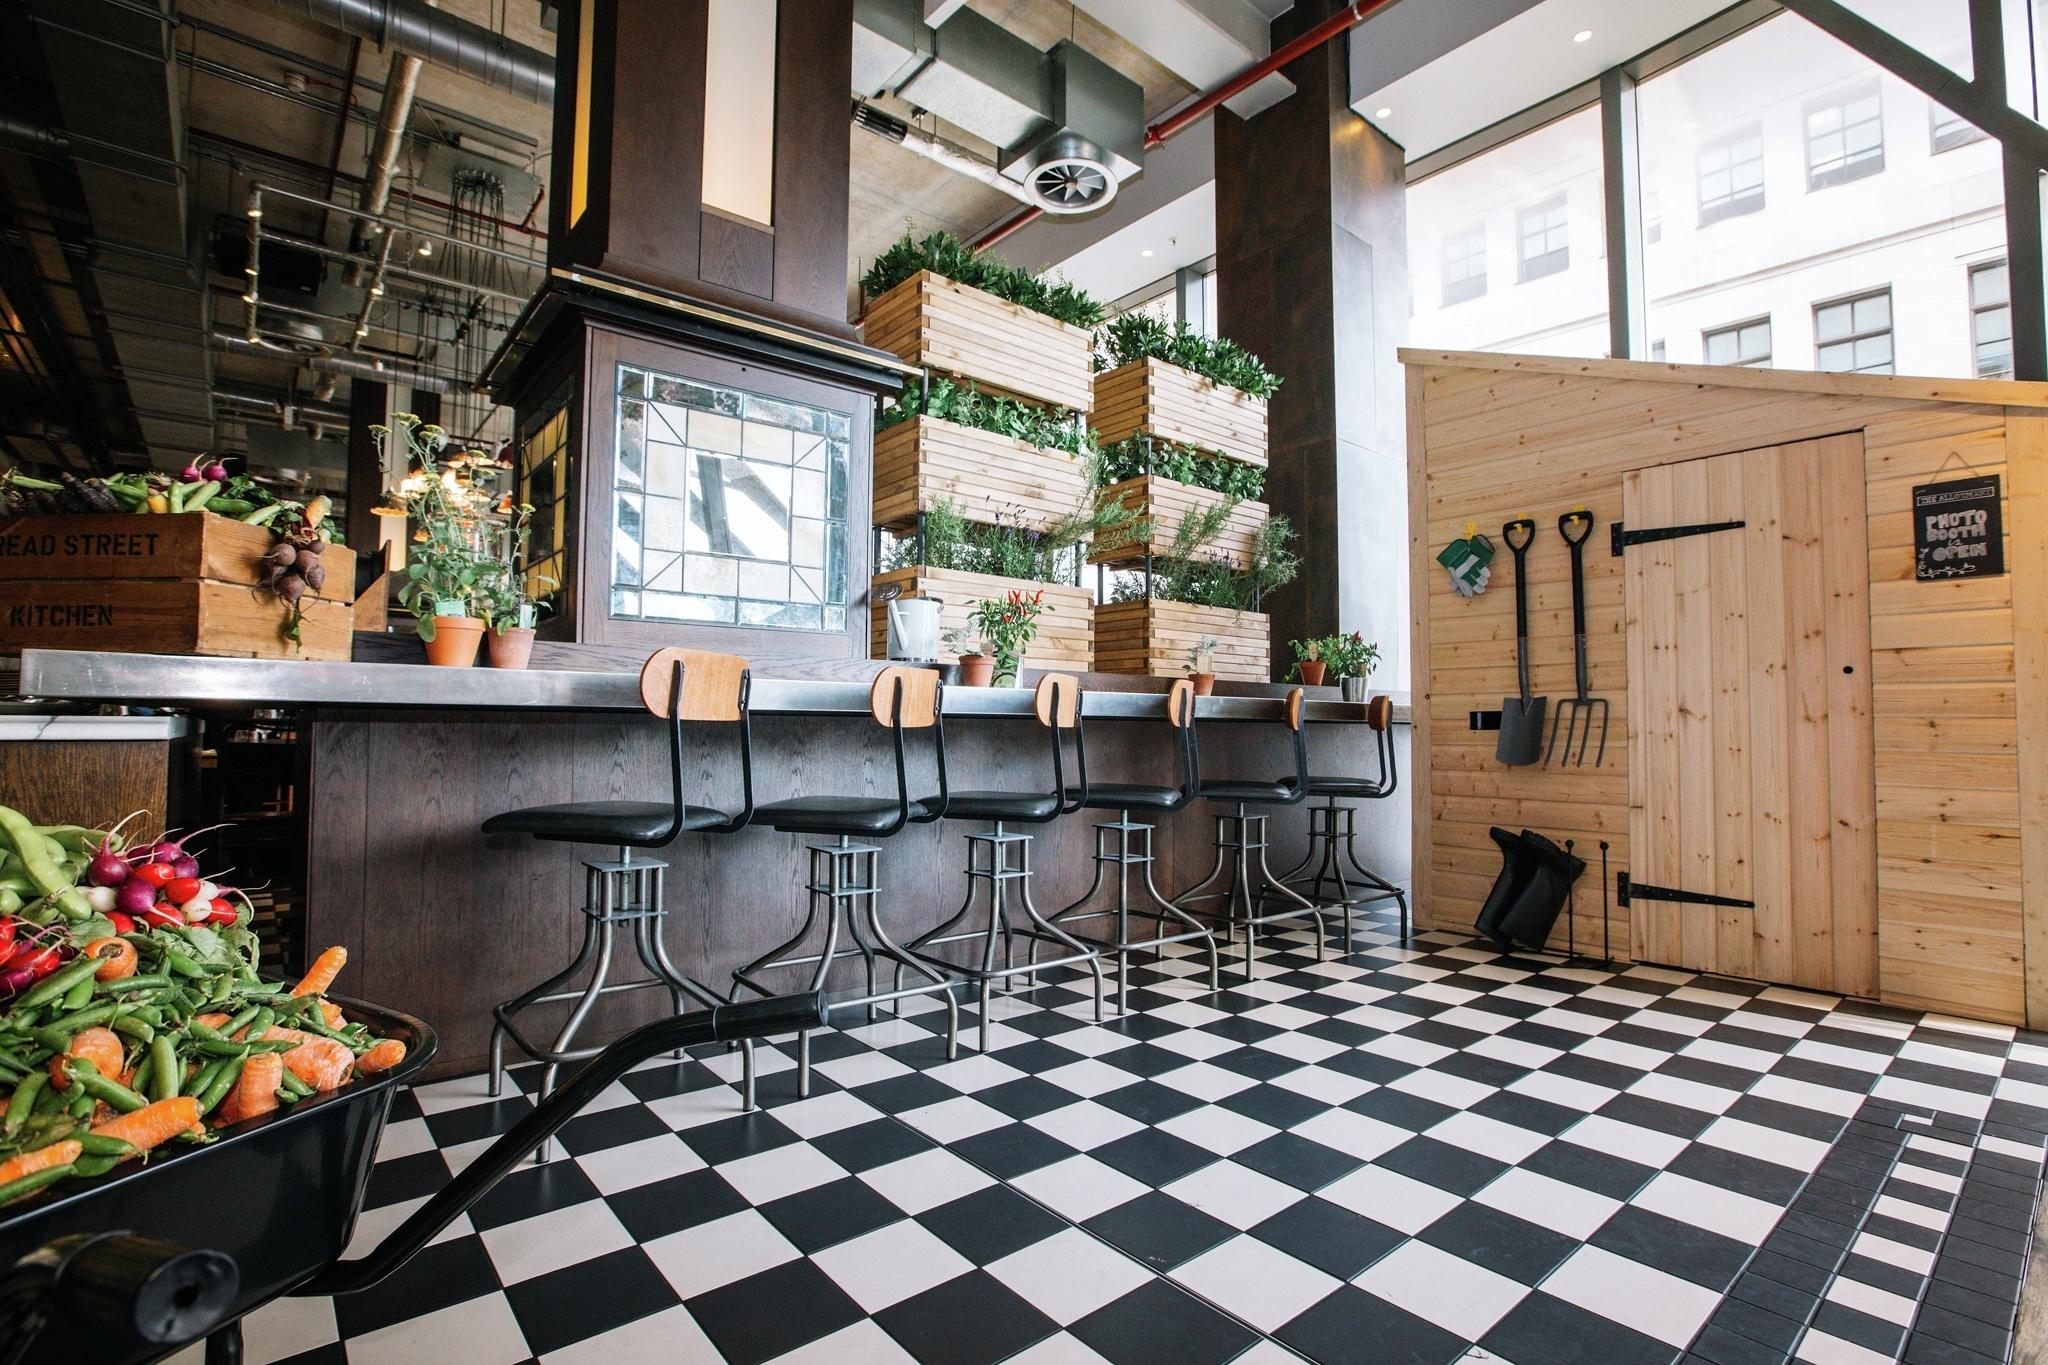 Gordon Ramsay's Bread Street Kitchen